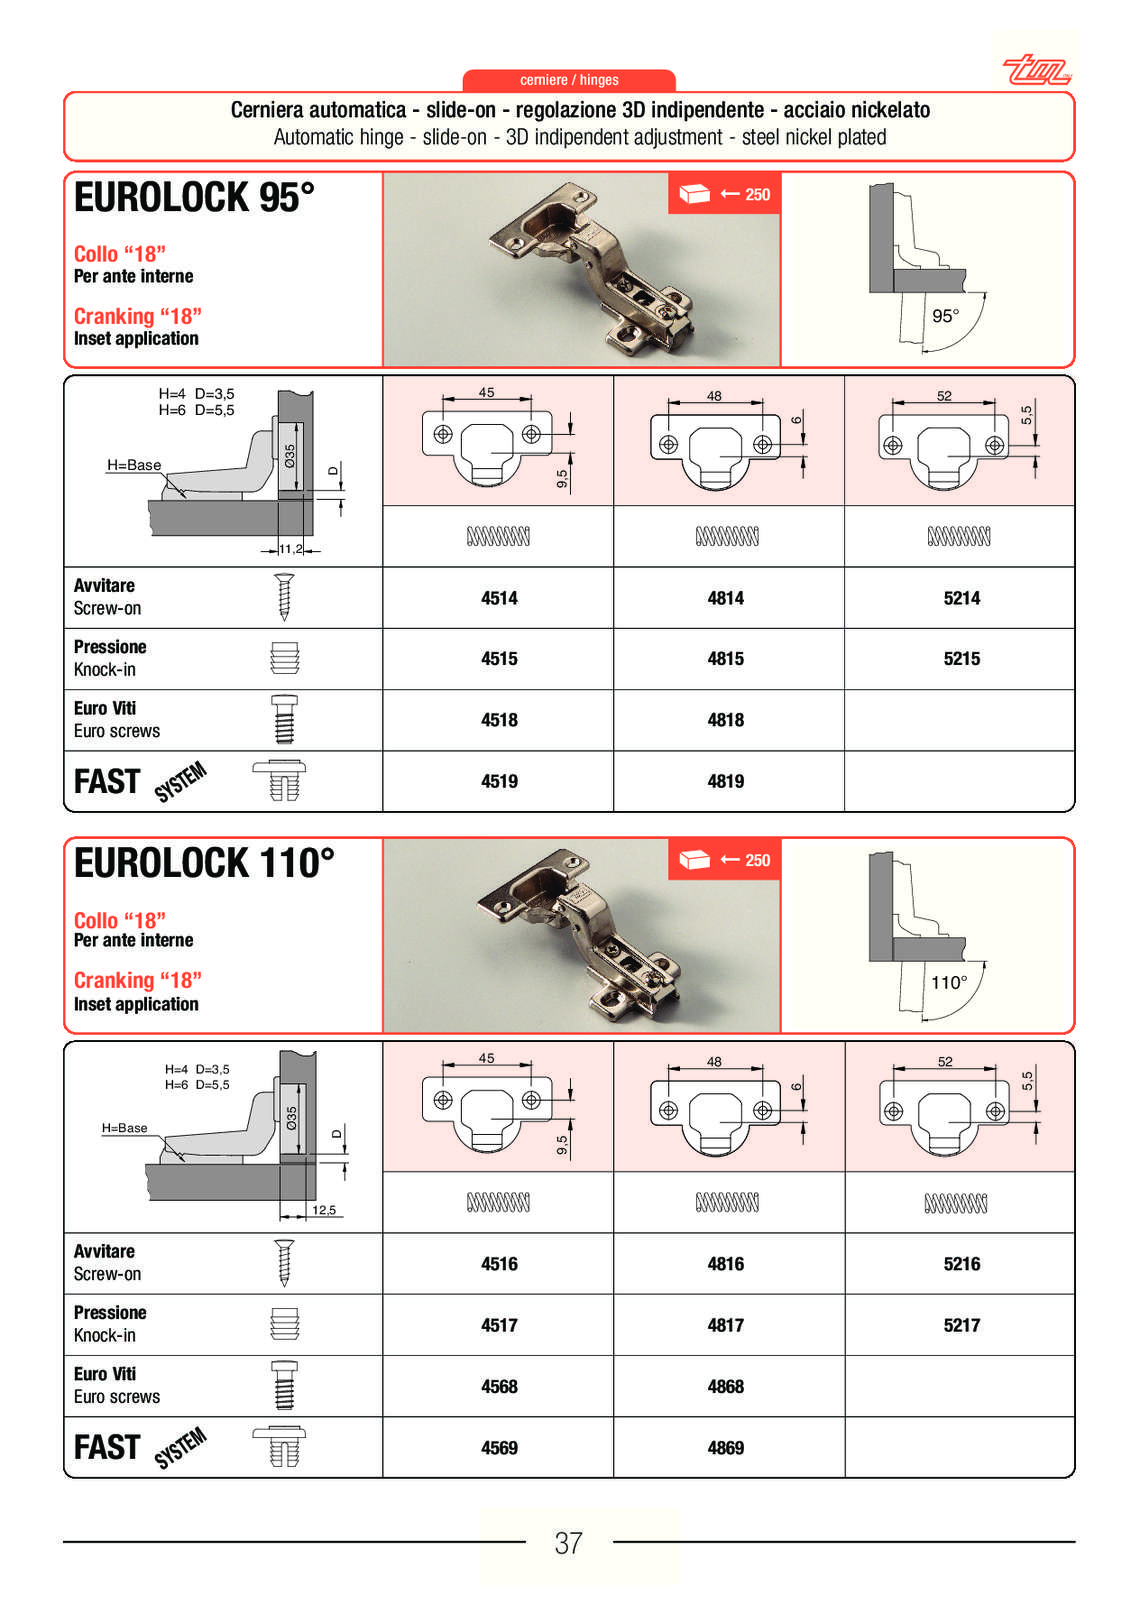 euro-hinges-catalogue_175_036.jpg